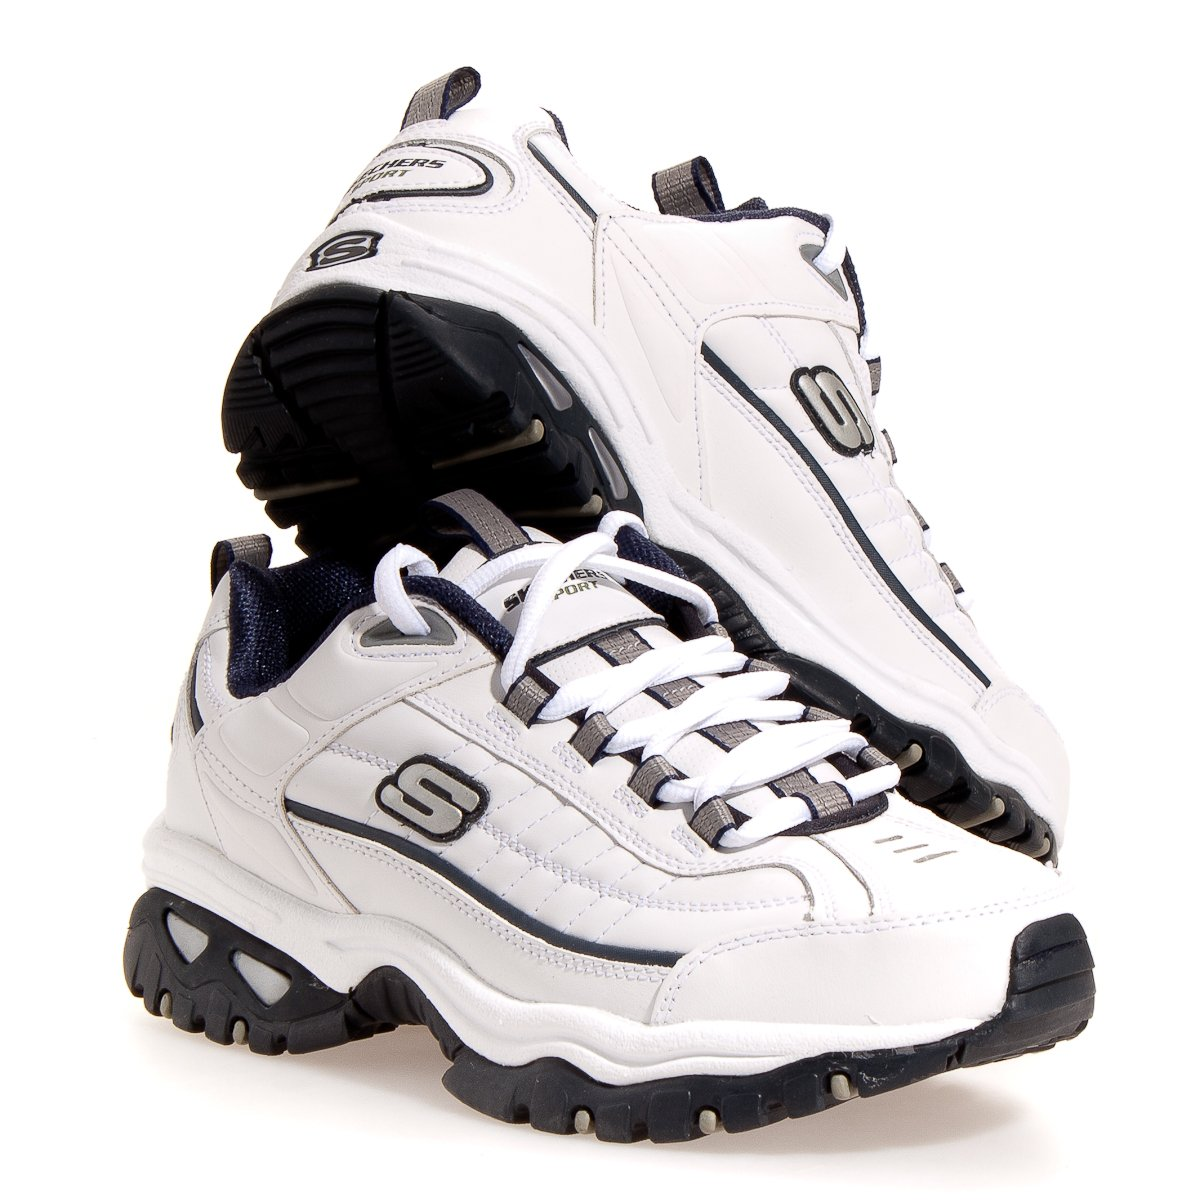 Skechers Energy After Burn Mens Sneakers White/Navy 8.5 W